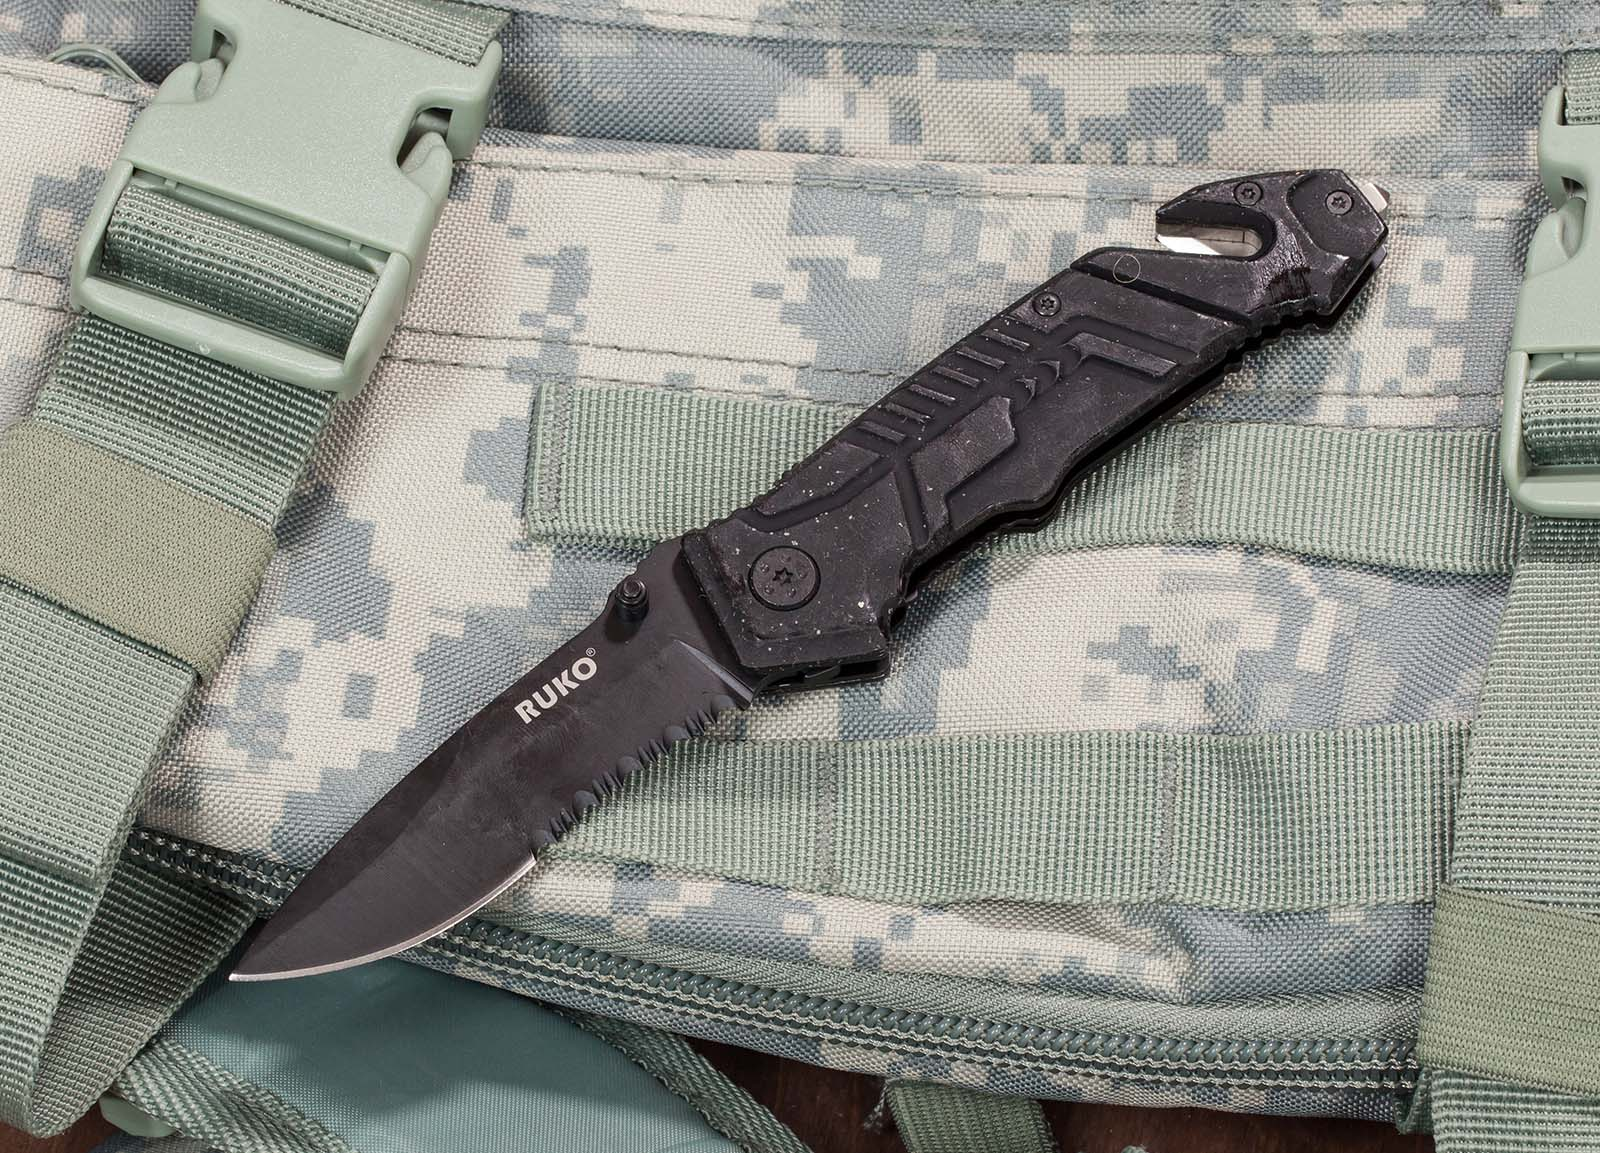 Тактический нож Ruko® Shark® 0144 Rescue Knife (Канада) - заказать оптом